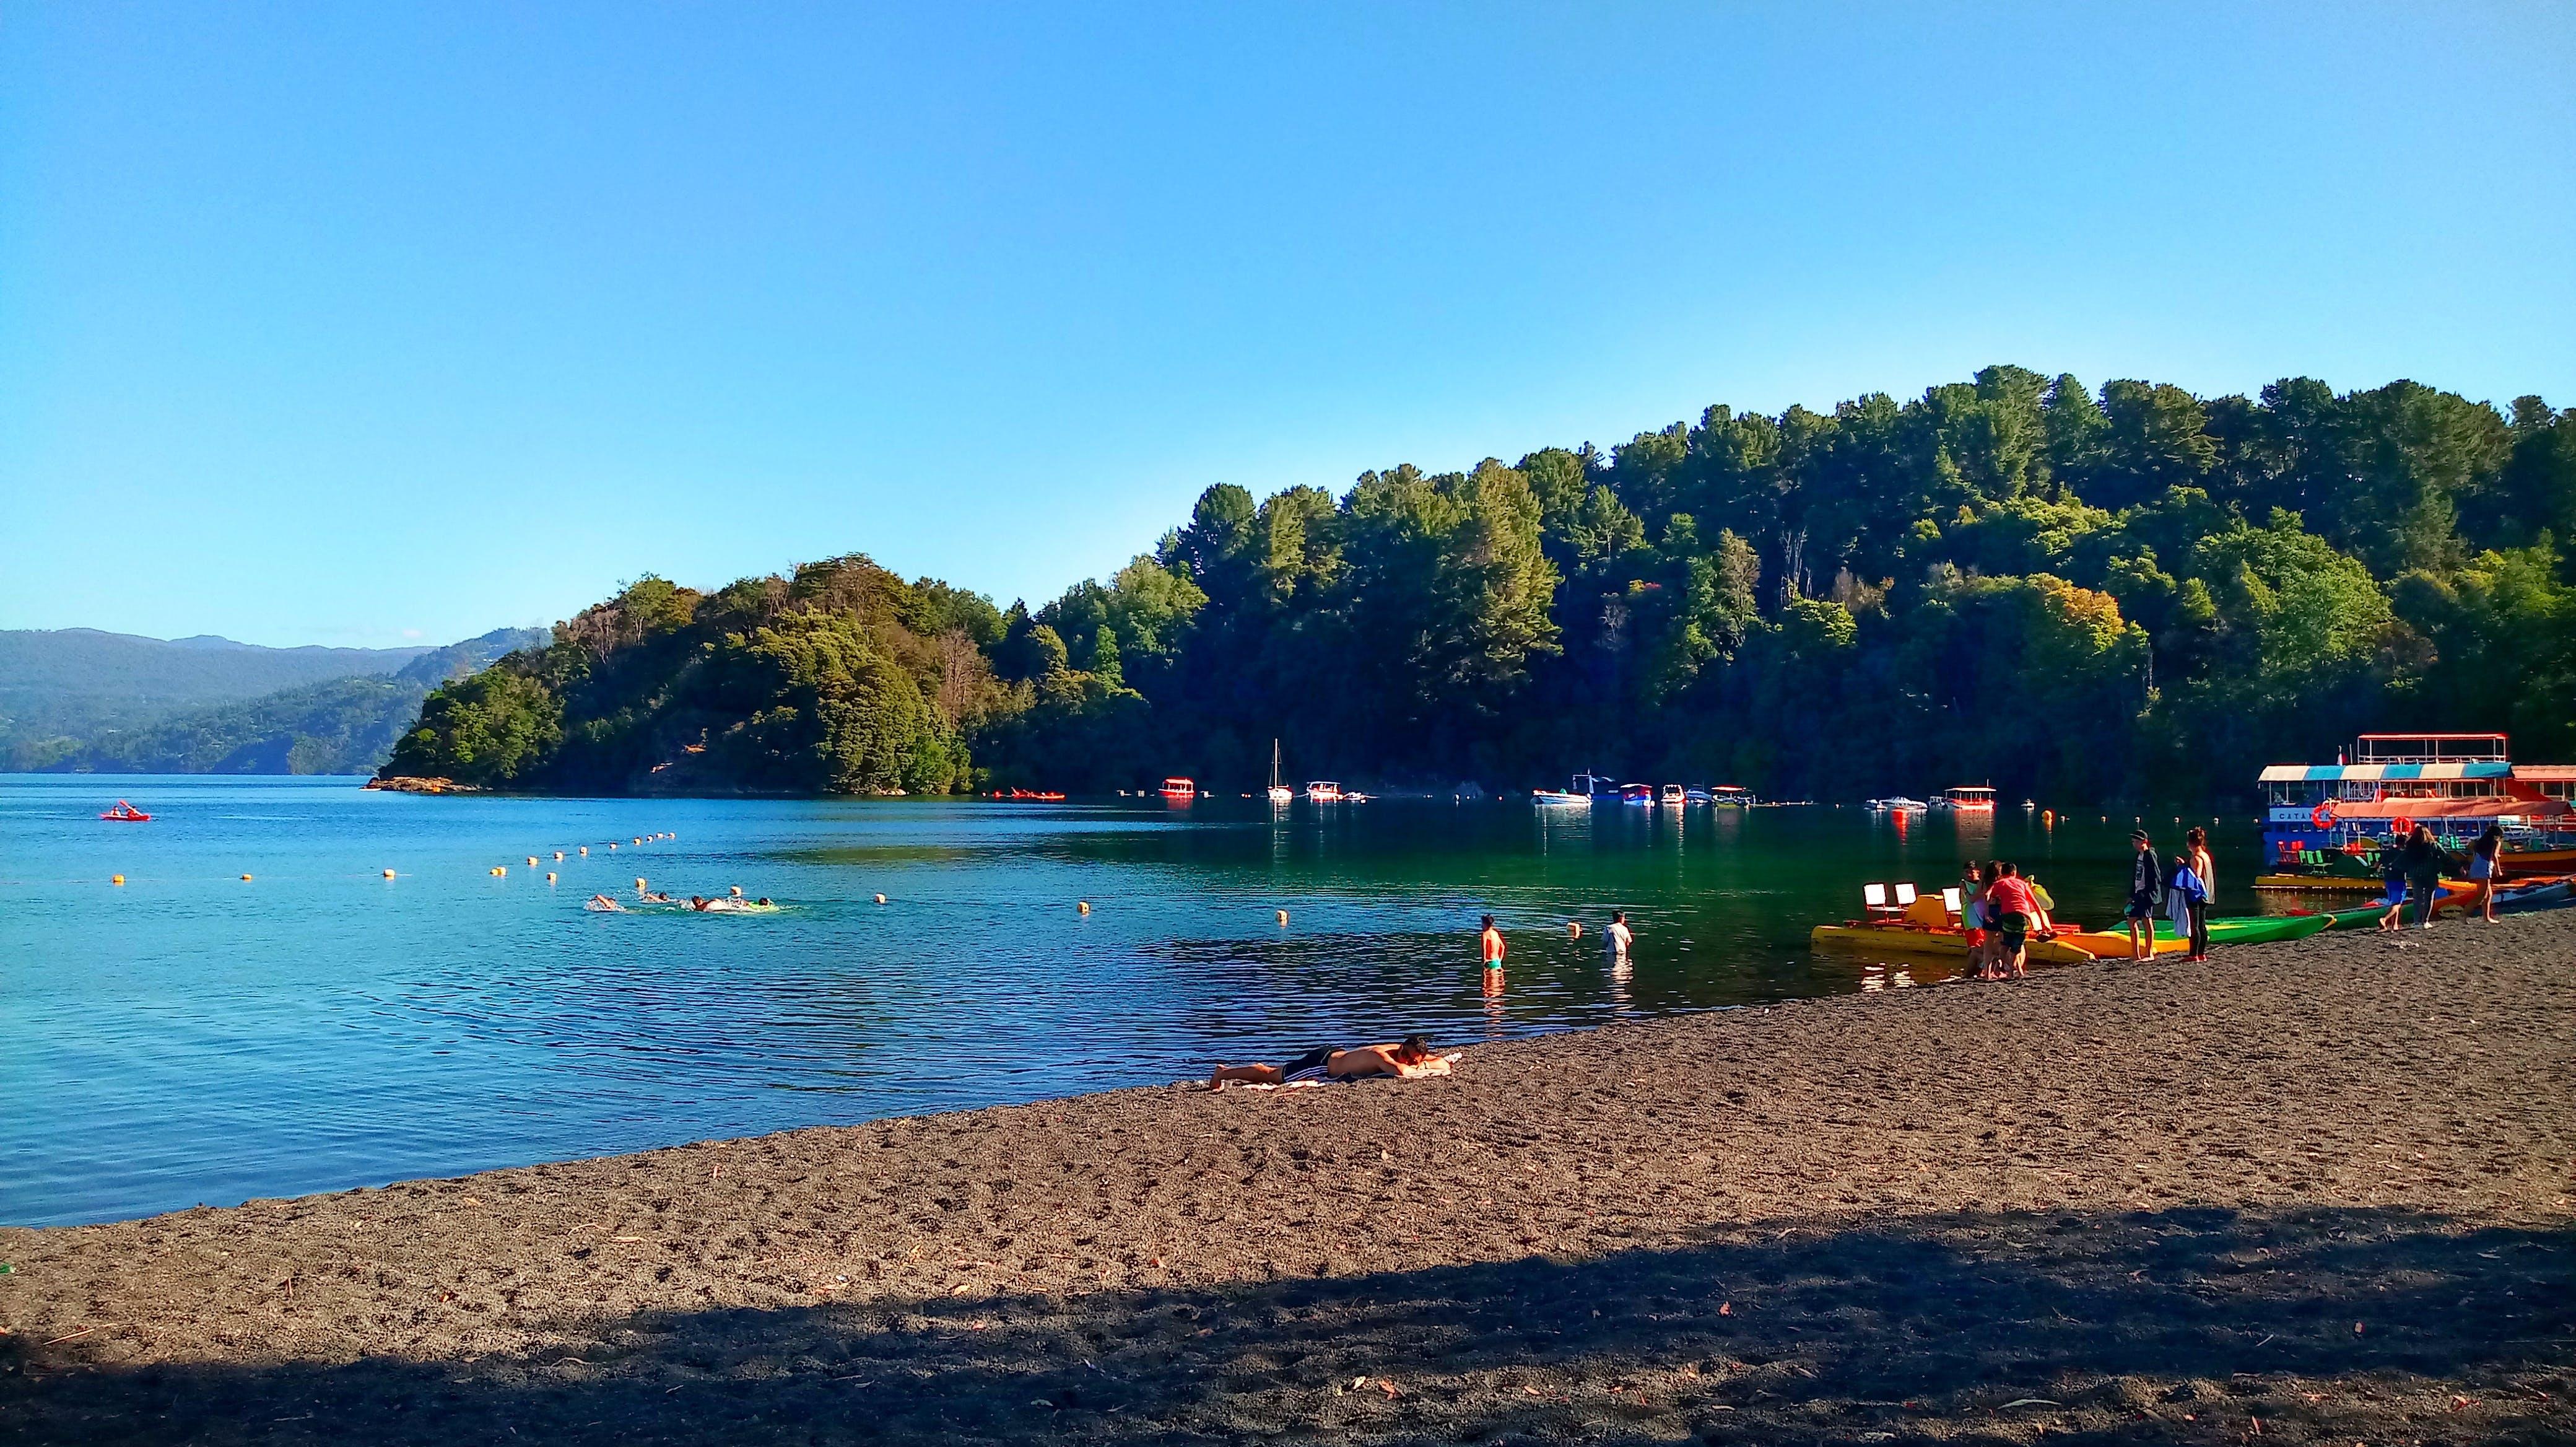 Free stock photo of beach, boats, mountain, people